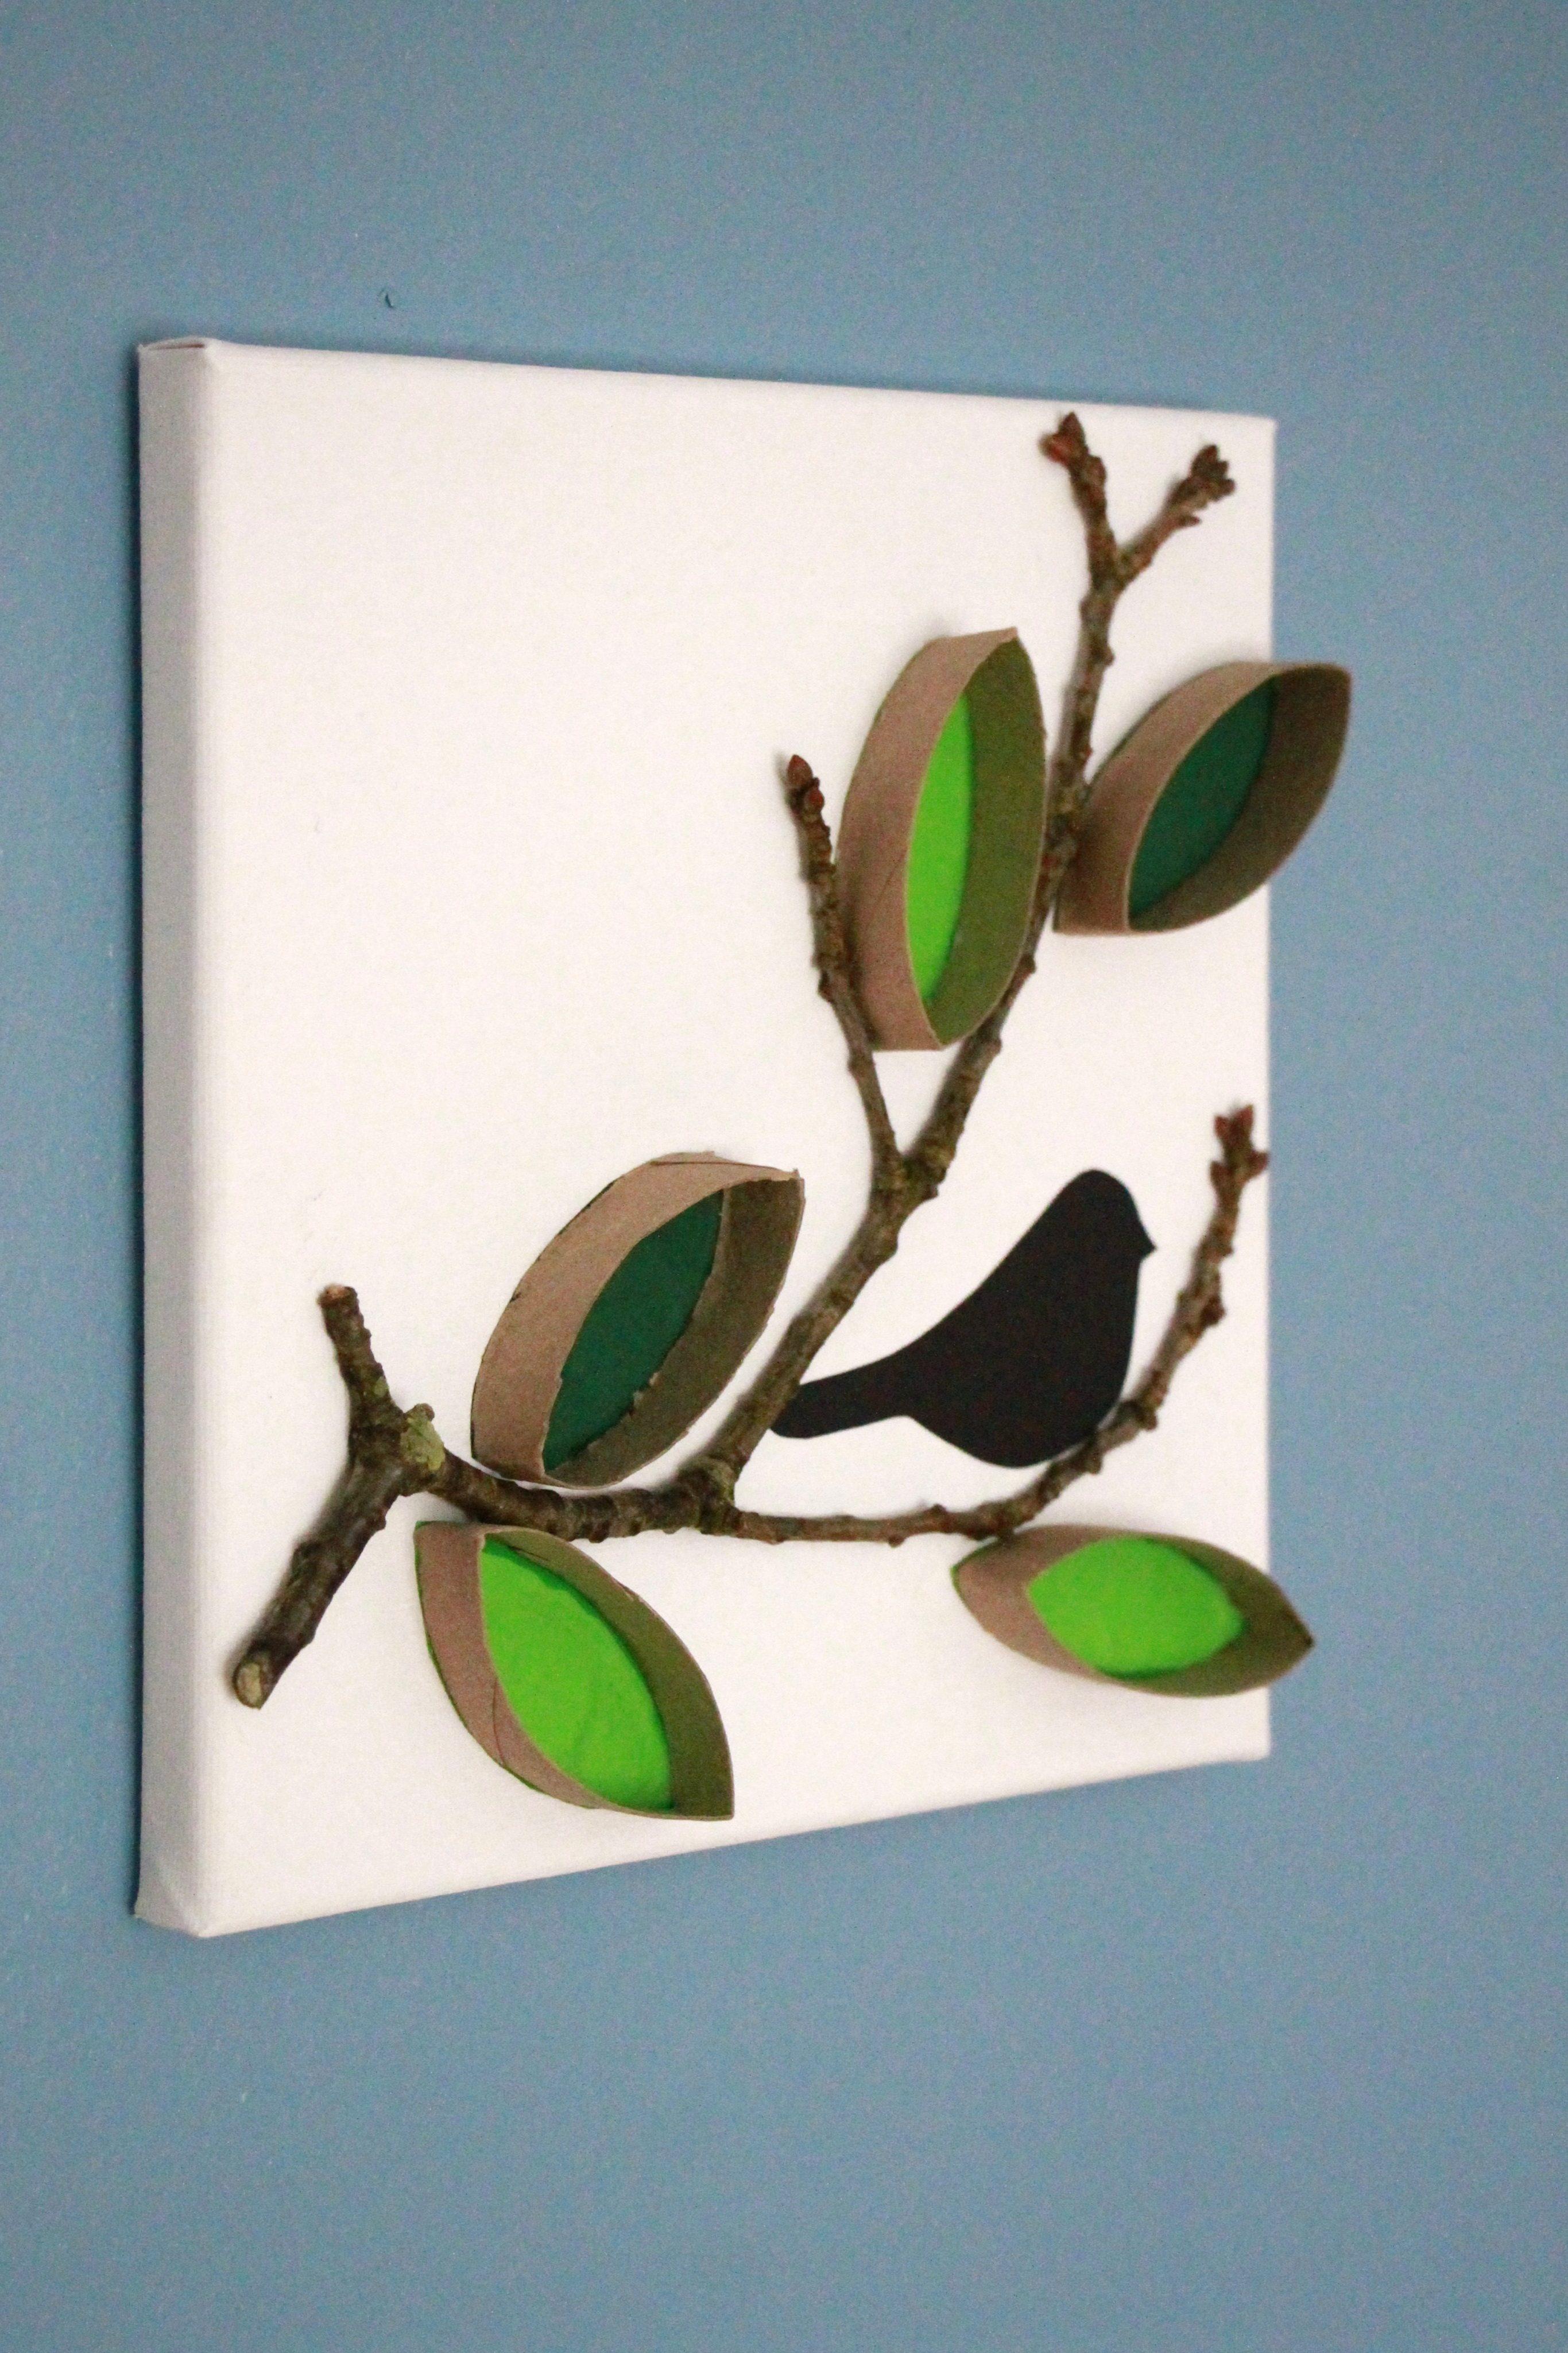 basteln mit klopapierrollen idee lavendelblog. Black Bedroom Furniture Sets. Home Design Ideas